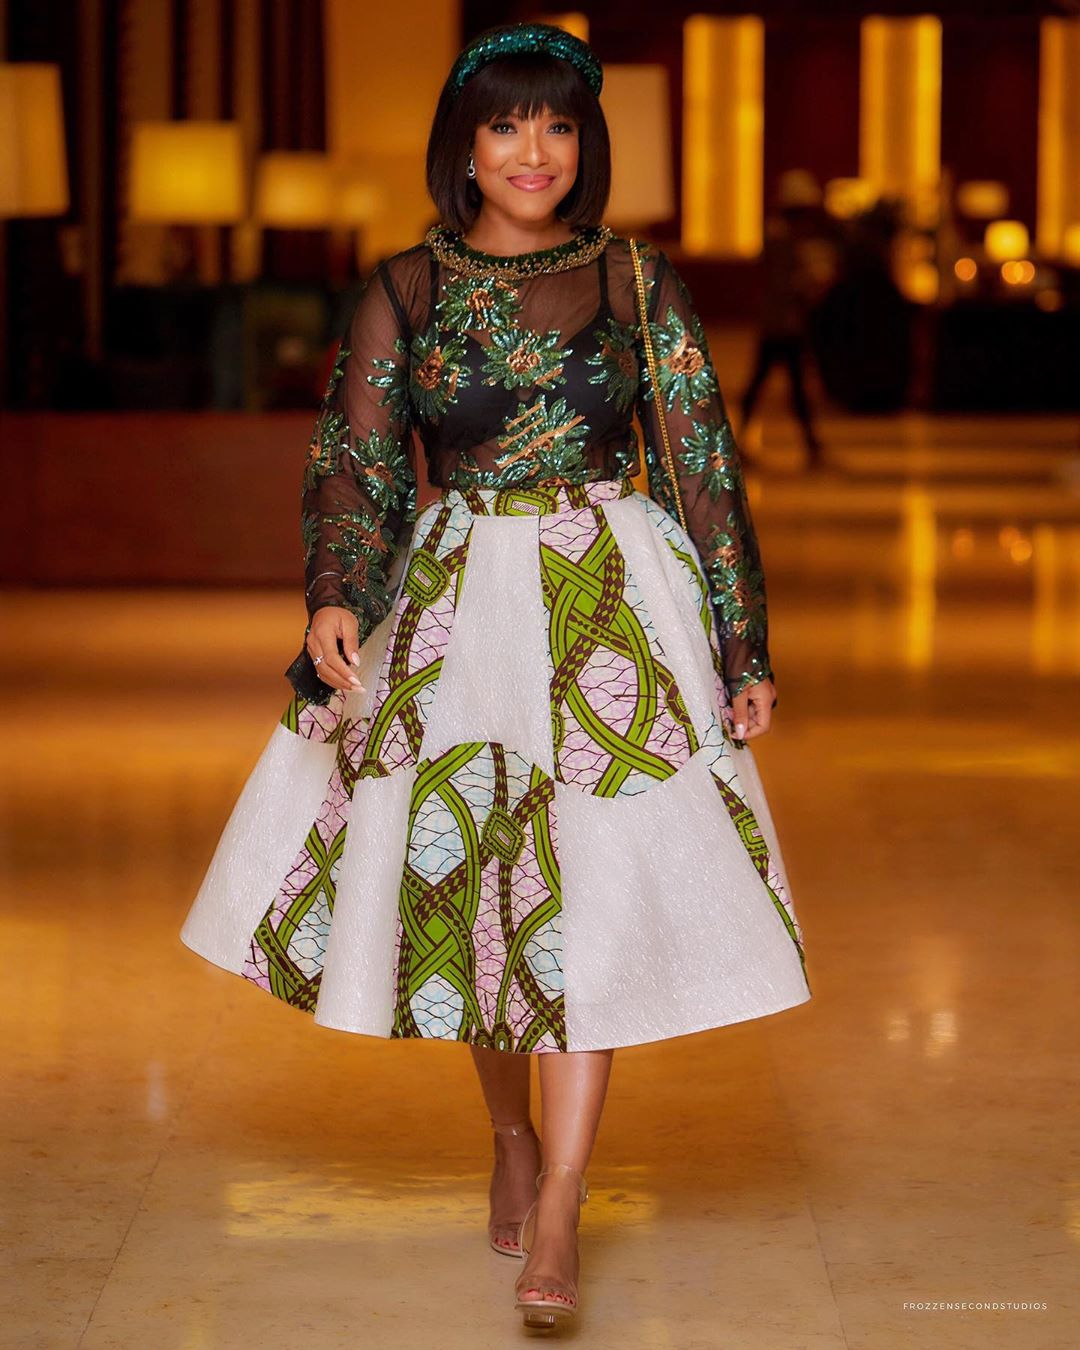 Joselyn-dumas-African-celebrities-style-week-ending-october-26th-stylish-celebs